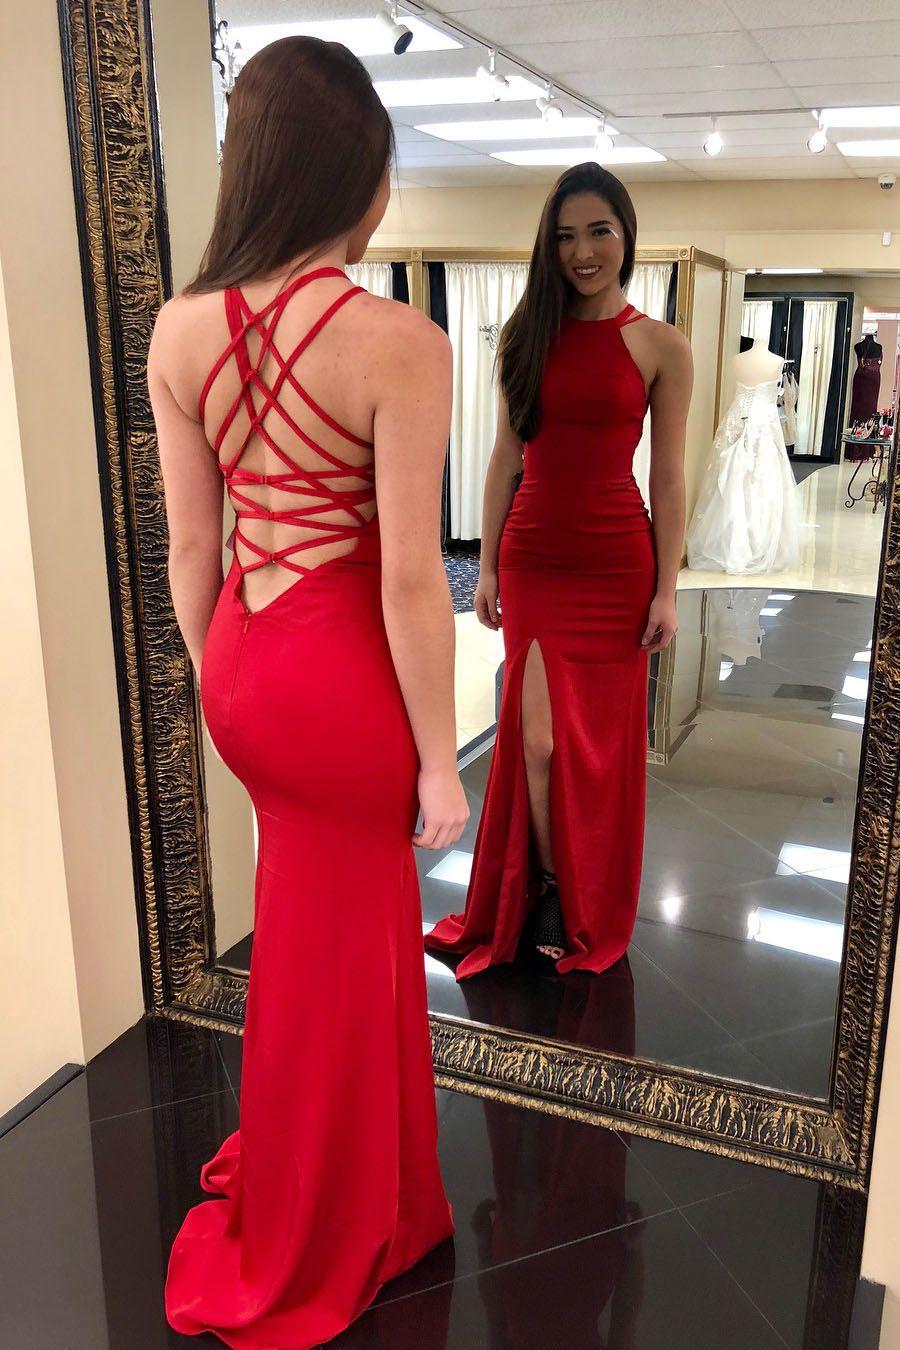 69023f605c Beads A-line V Neck Teal Long Prom Dress Formal Dress in 2019 ...